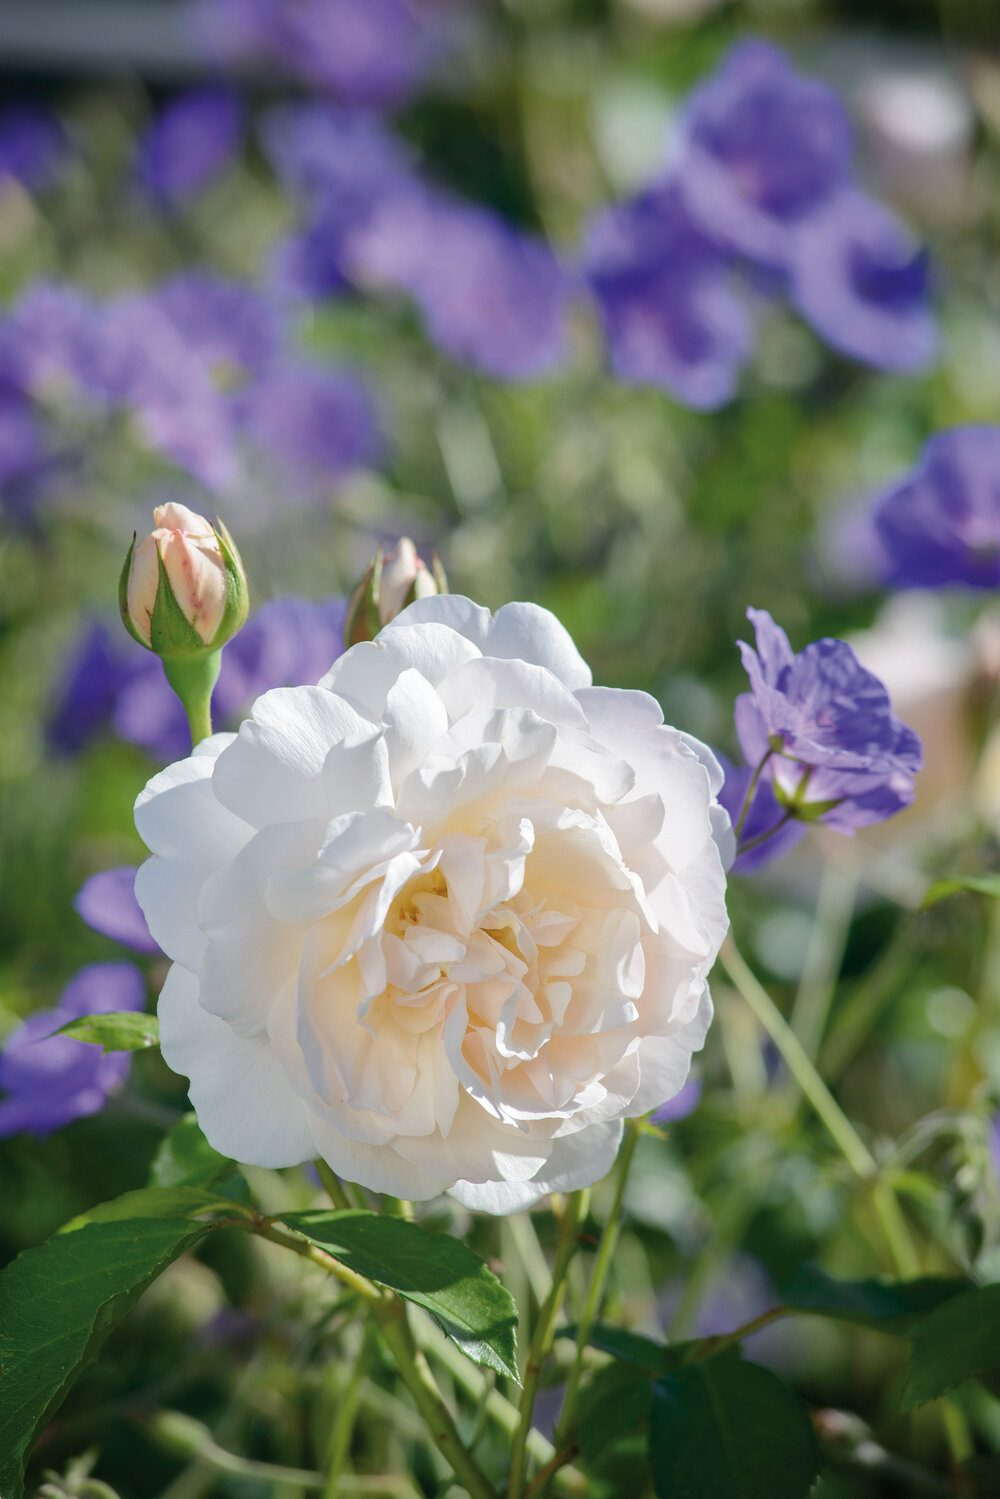 lichfield-angel-david-austin-english-rose